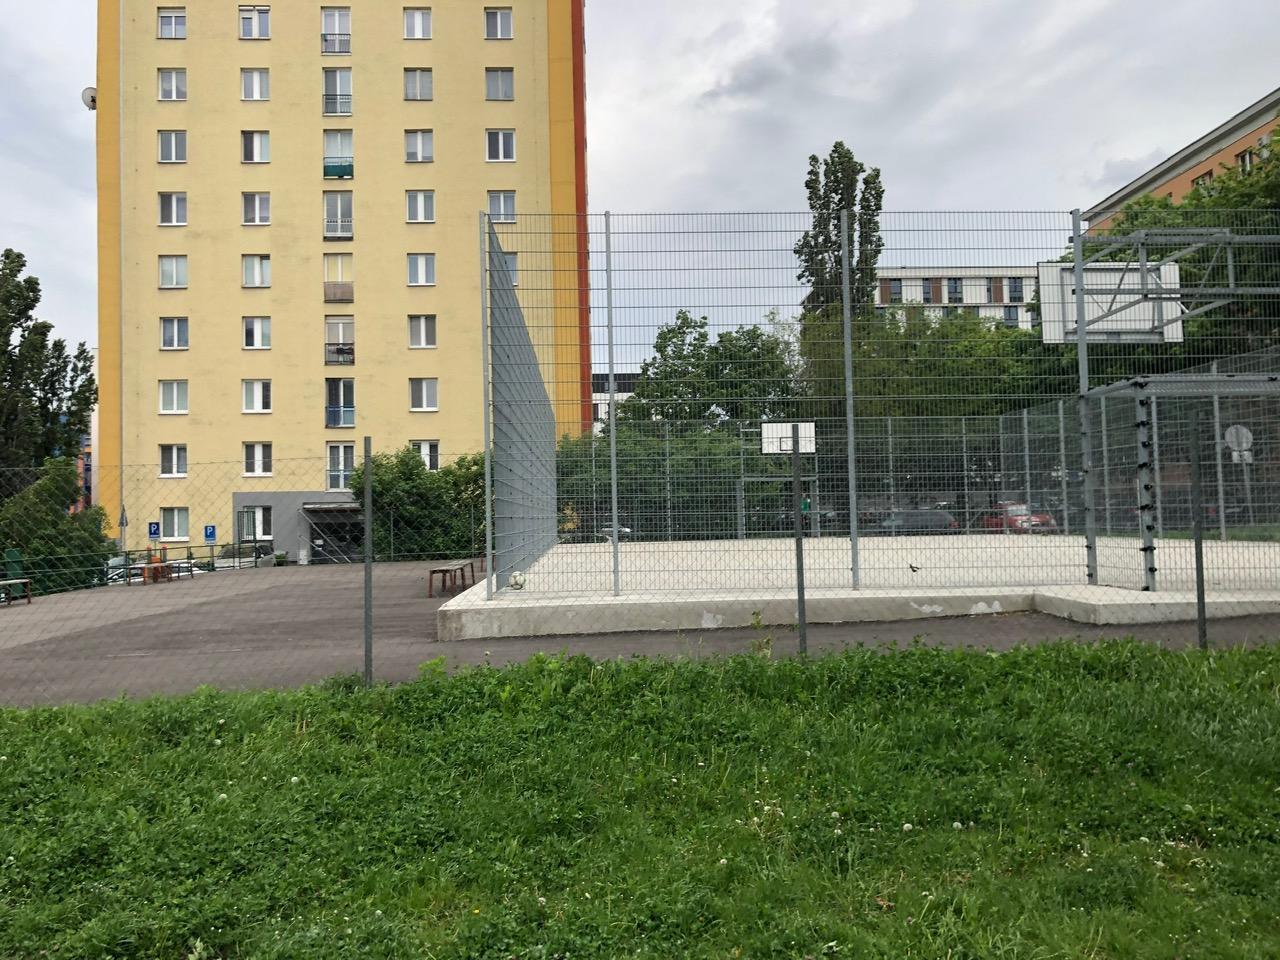 3 izbový byt, Račianska 85, 63m2, balkon 10m2, výborná lokalita-8